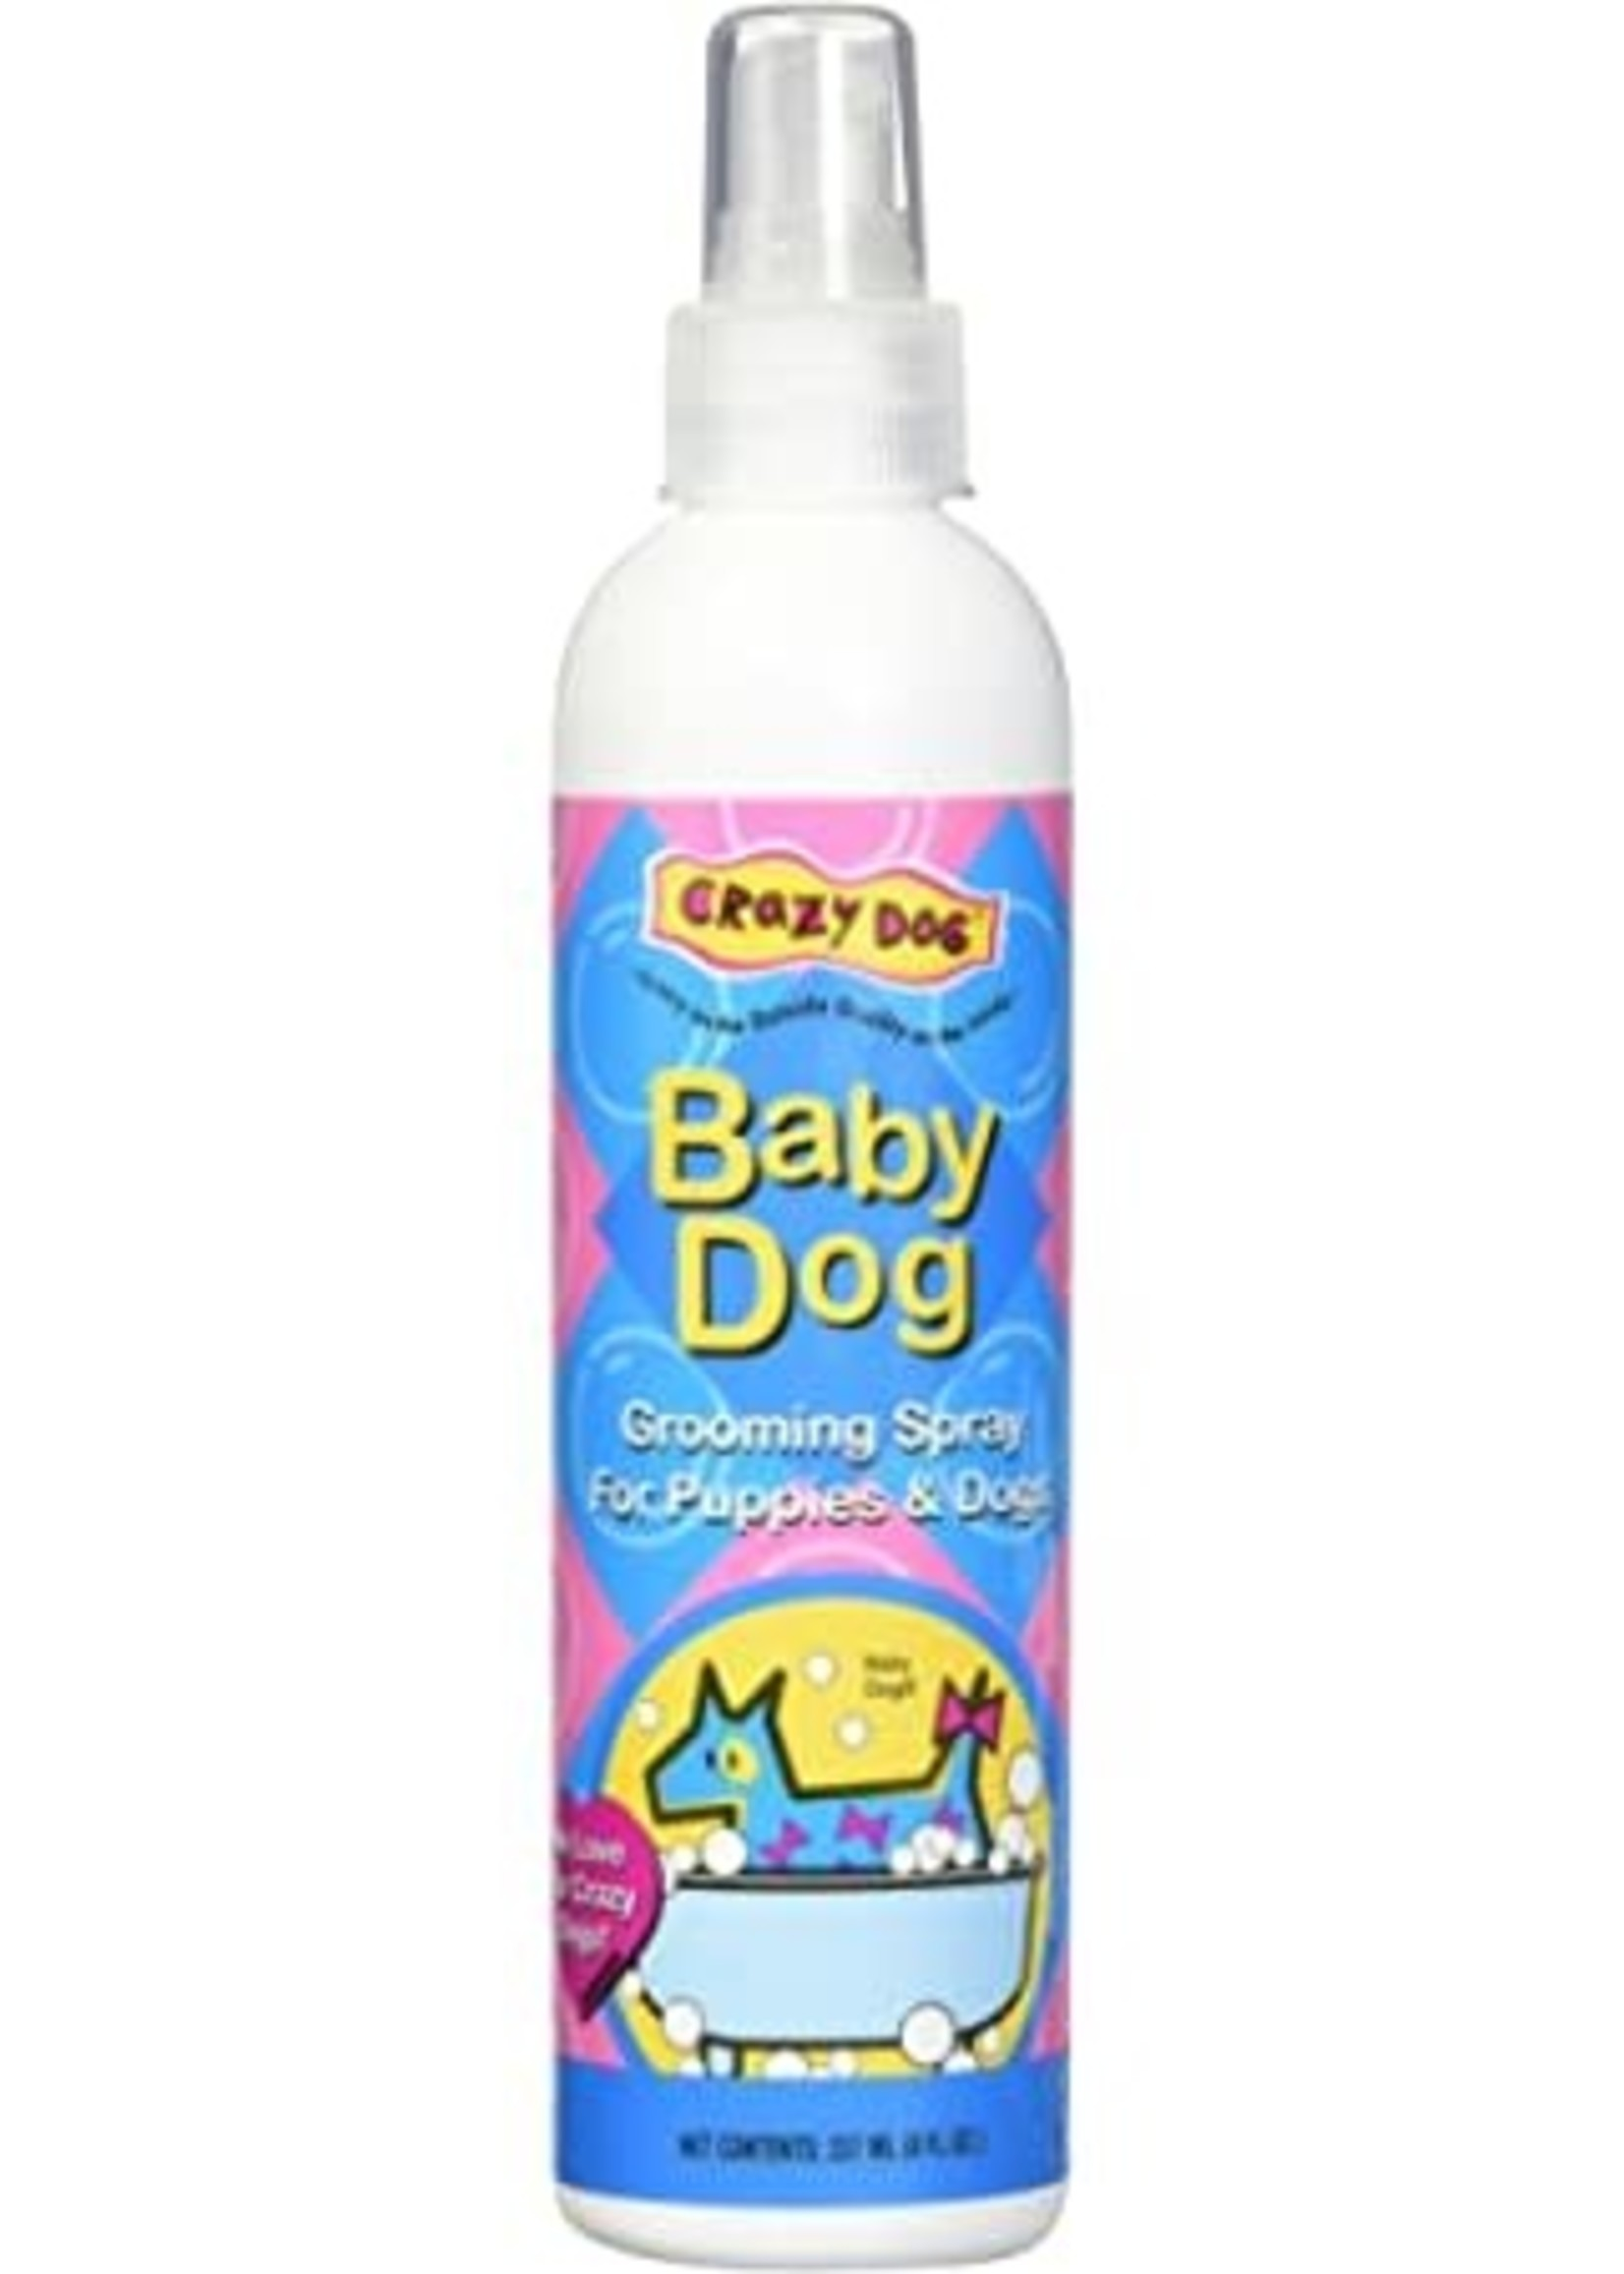 Cardinal Labs® CRAZY DOG BABY POWDER GROOMING SPRAY 8oz